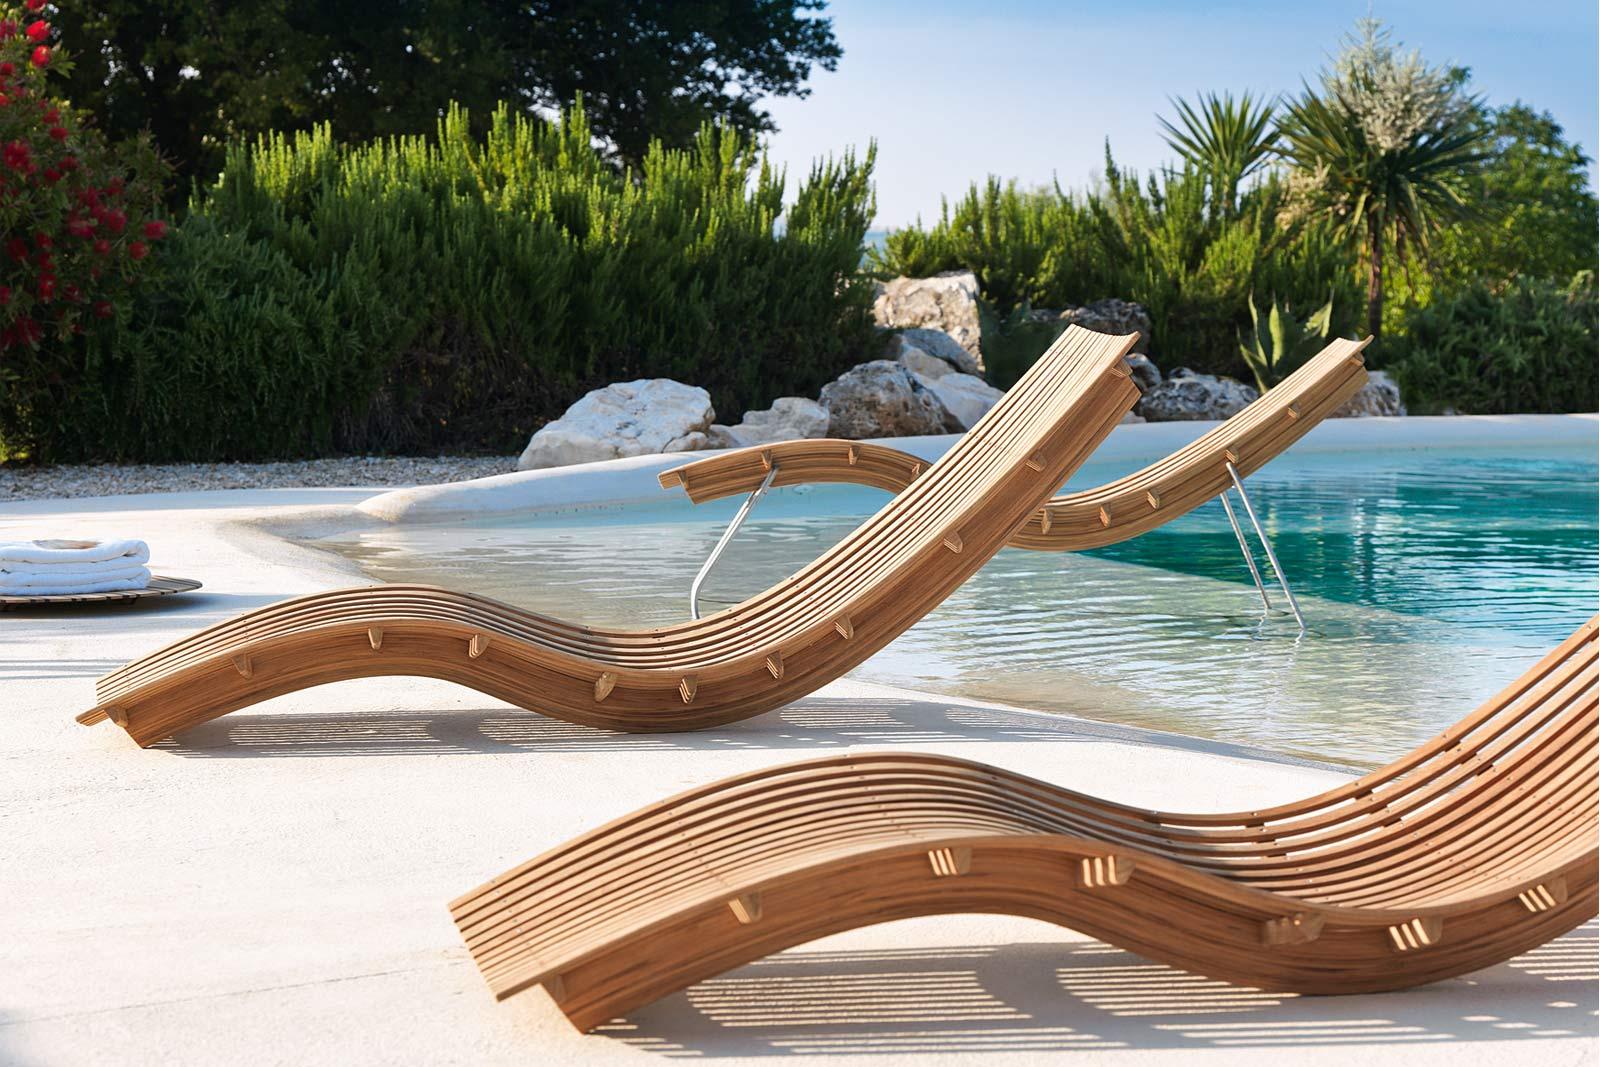 Gartenmöbel aus feinsten Materialien